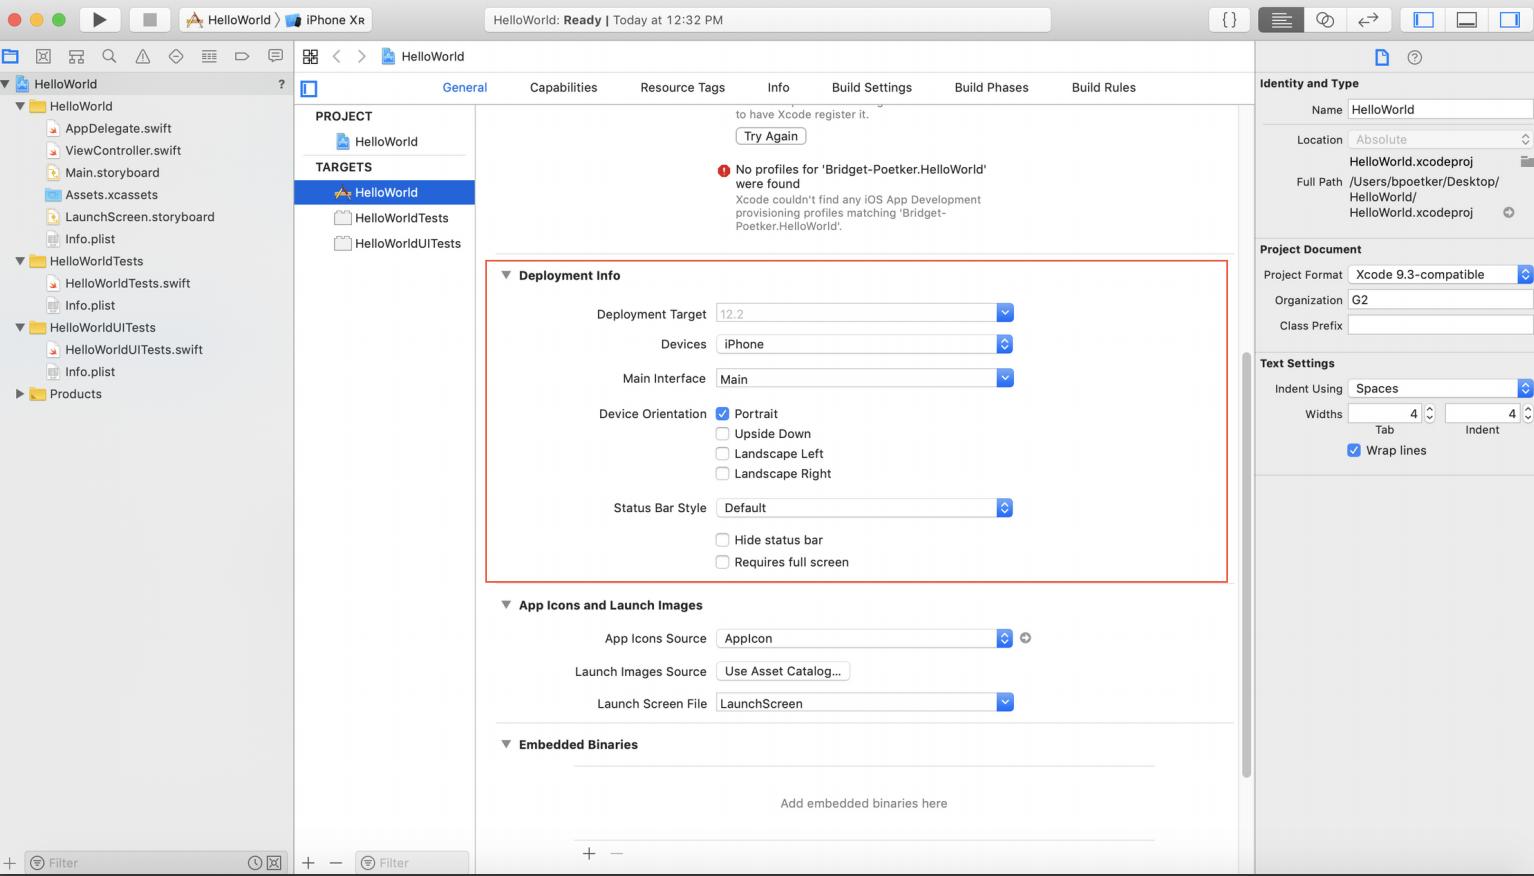 Deployment info in Xcode